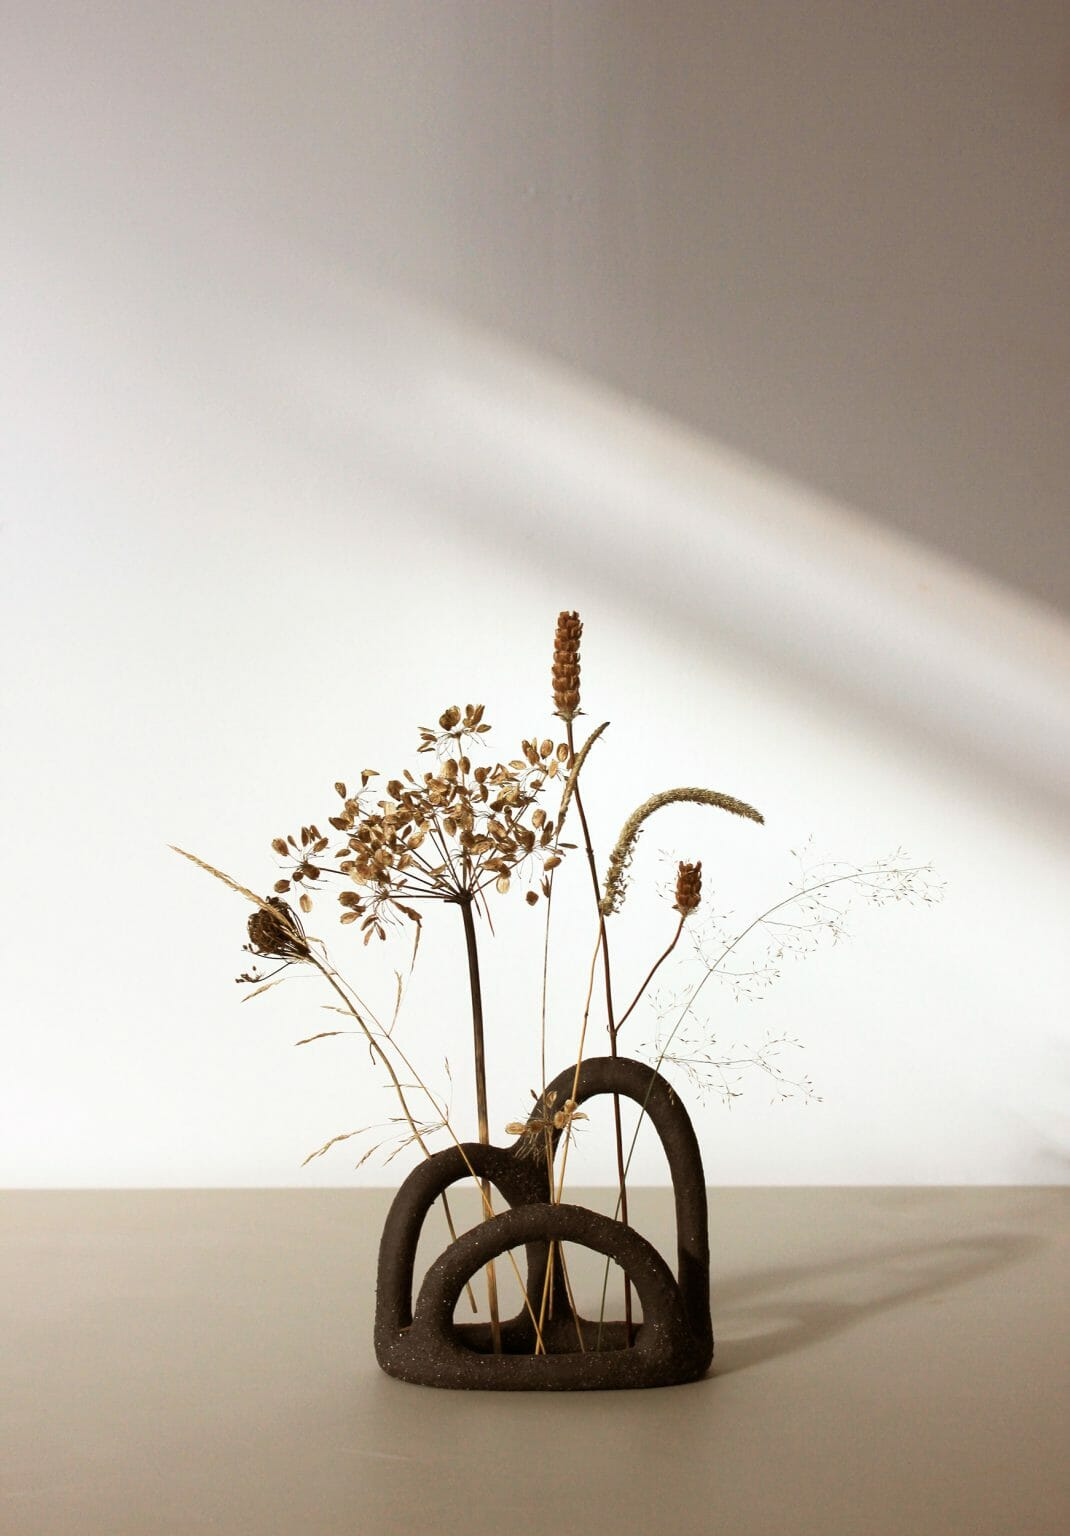 the-mountain-budvase-ceramics-plants-homeware-decoration-british-design